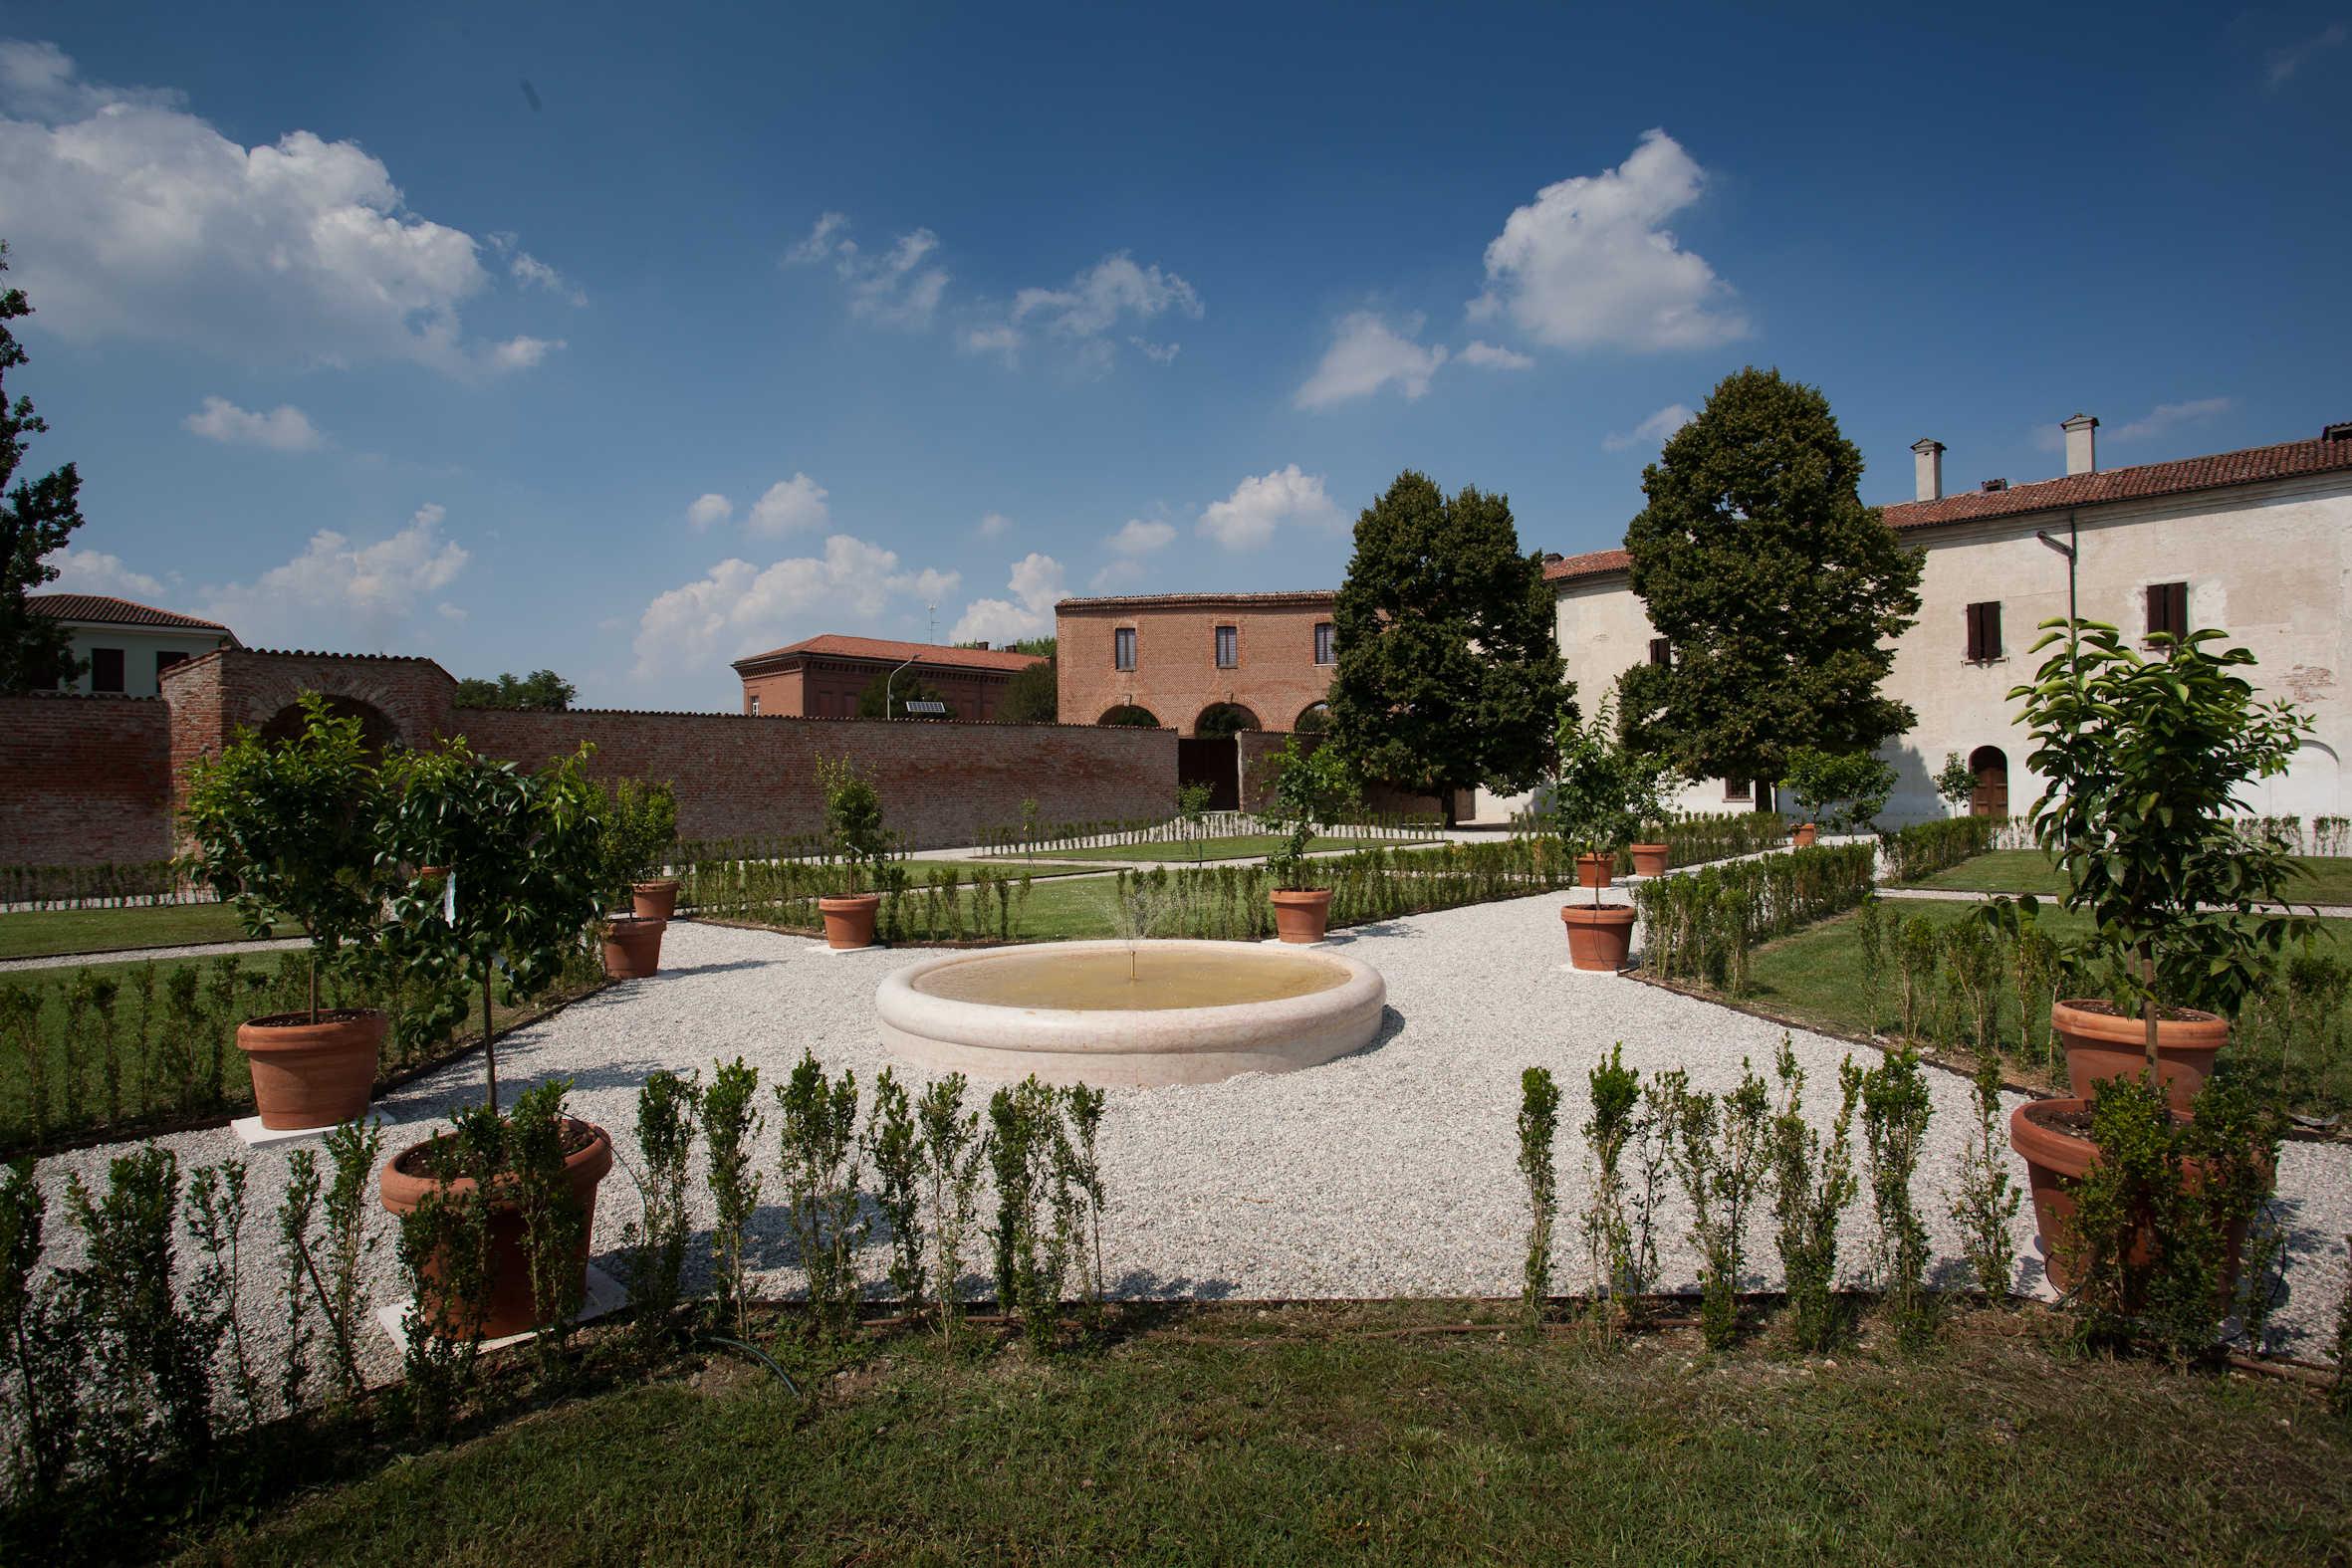 Recupero dei giardini di Palazzo Giardino - Sabbioneta (MN)